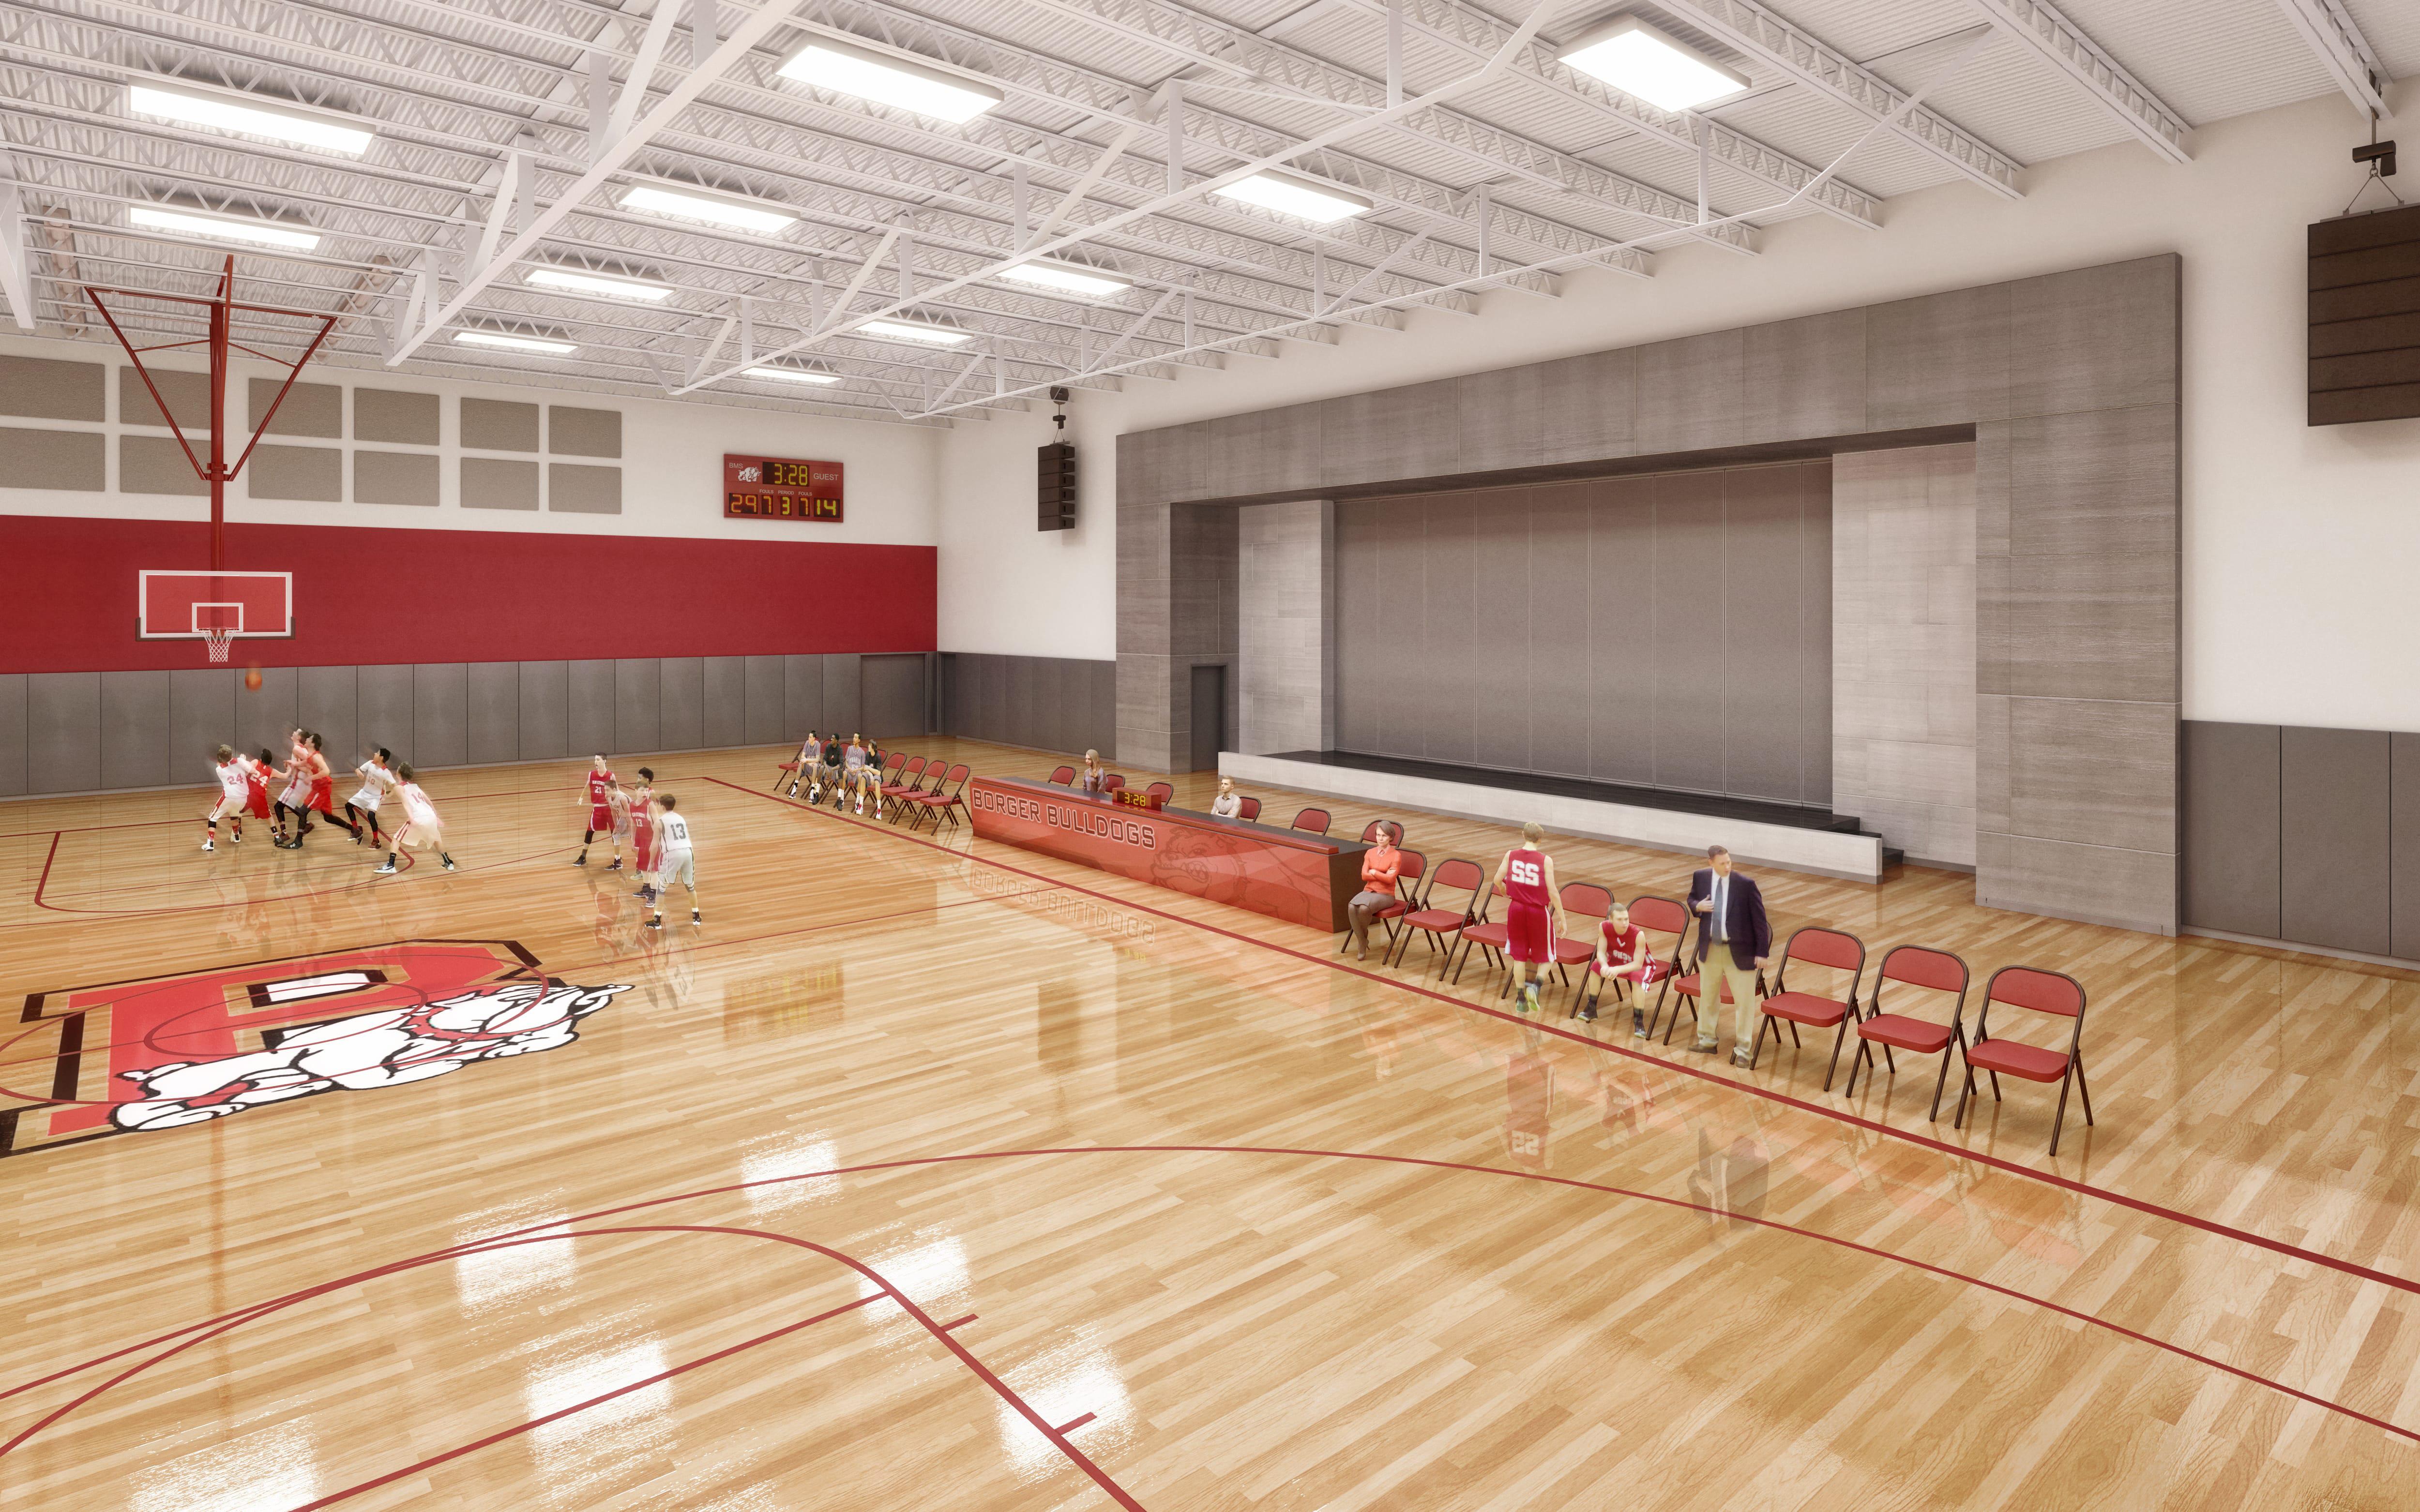 BorgerMS-Gym-Basketball (1)-min.jpg